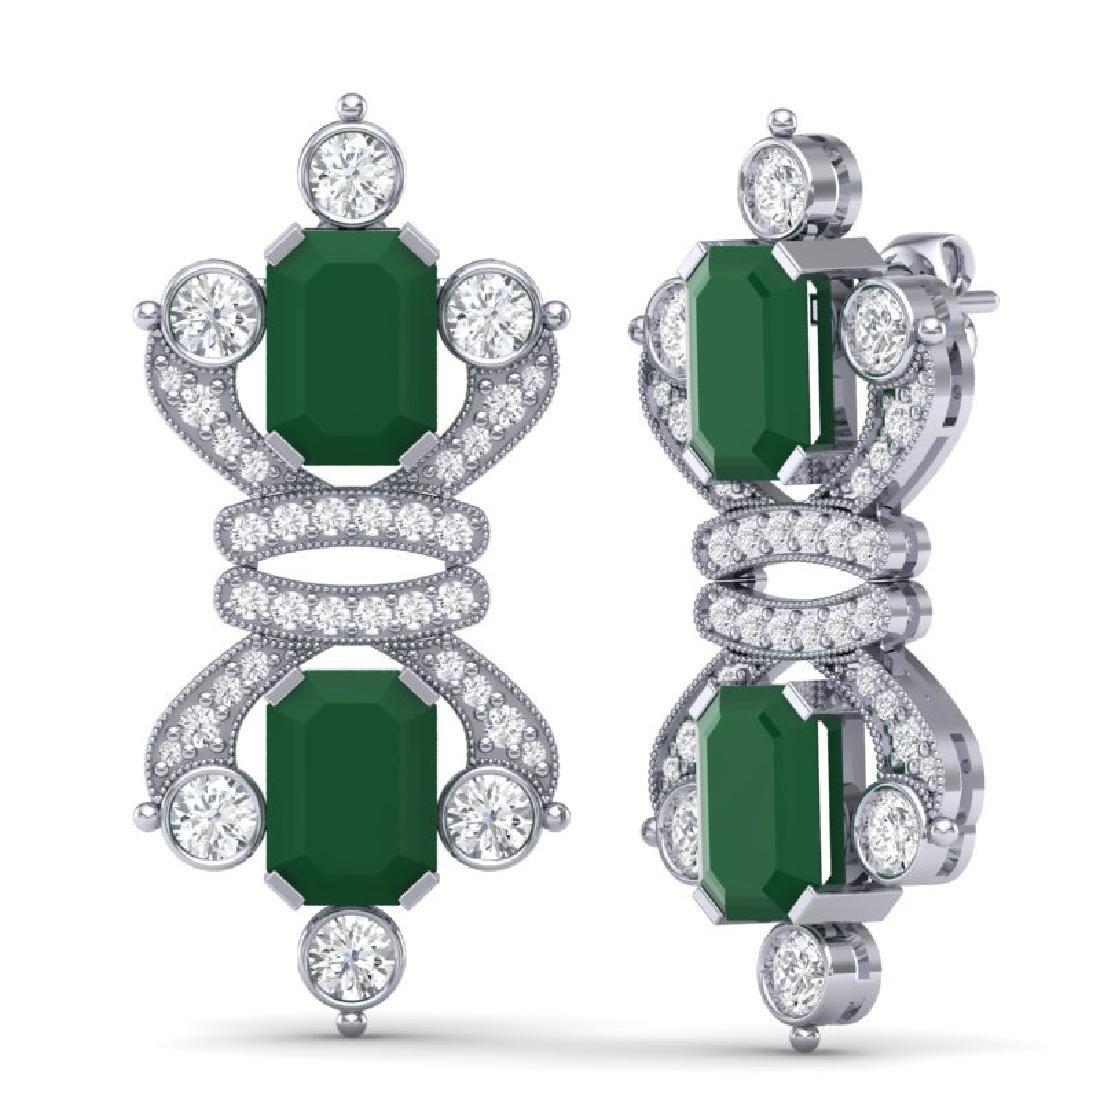 27.36 CTW Royalty Emerald & VS Diamond Earrings 18K - 3